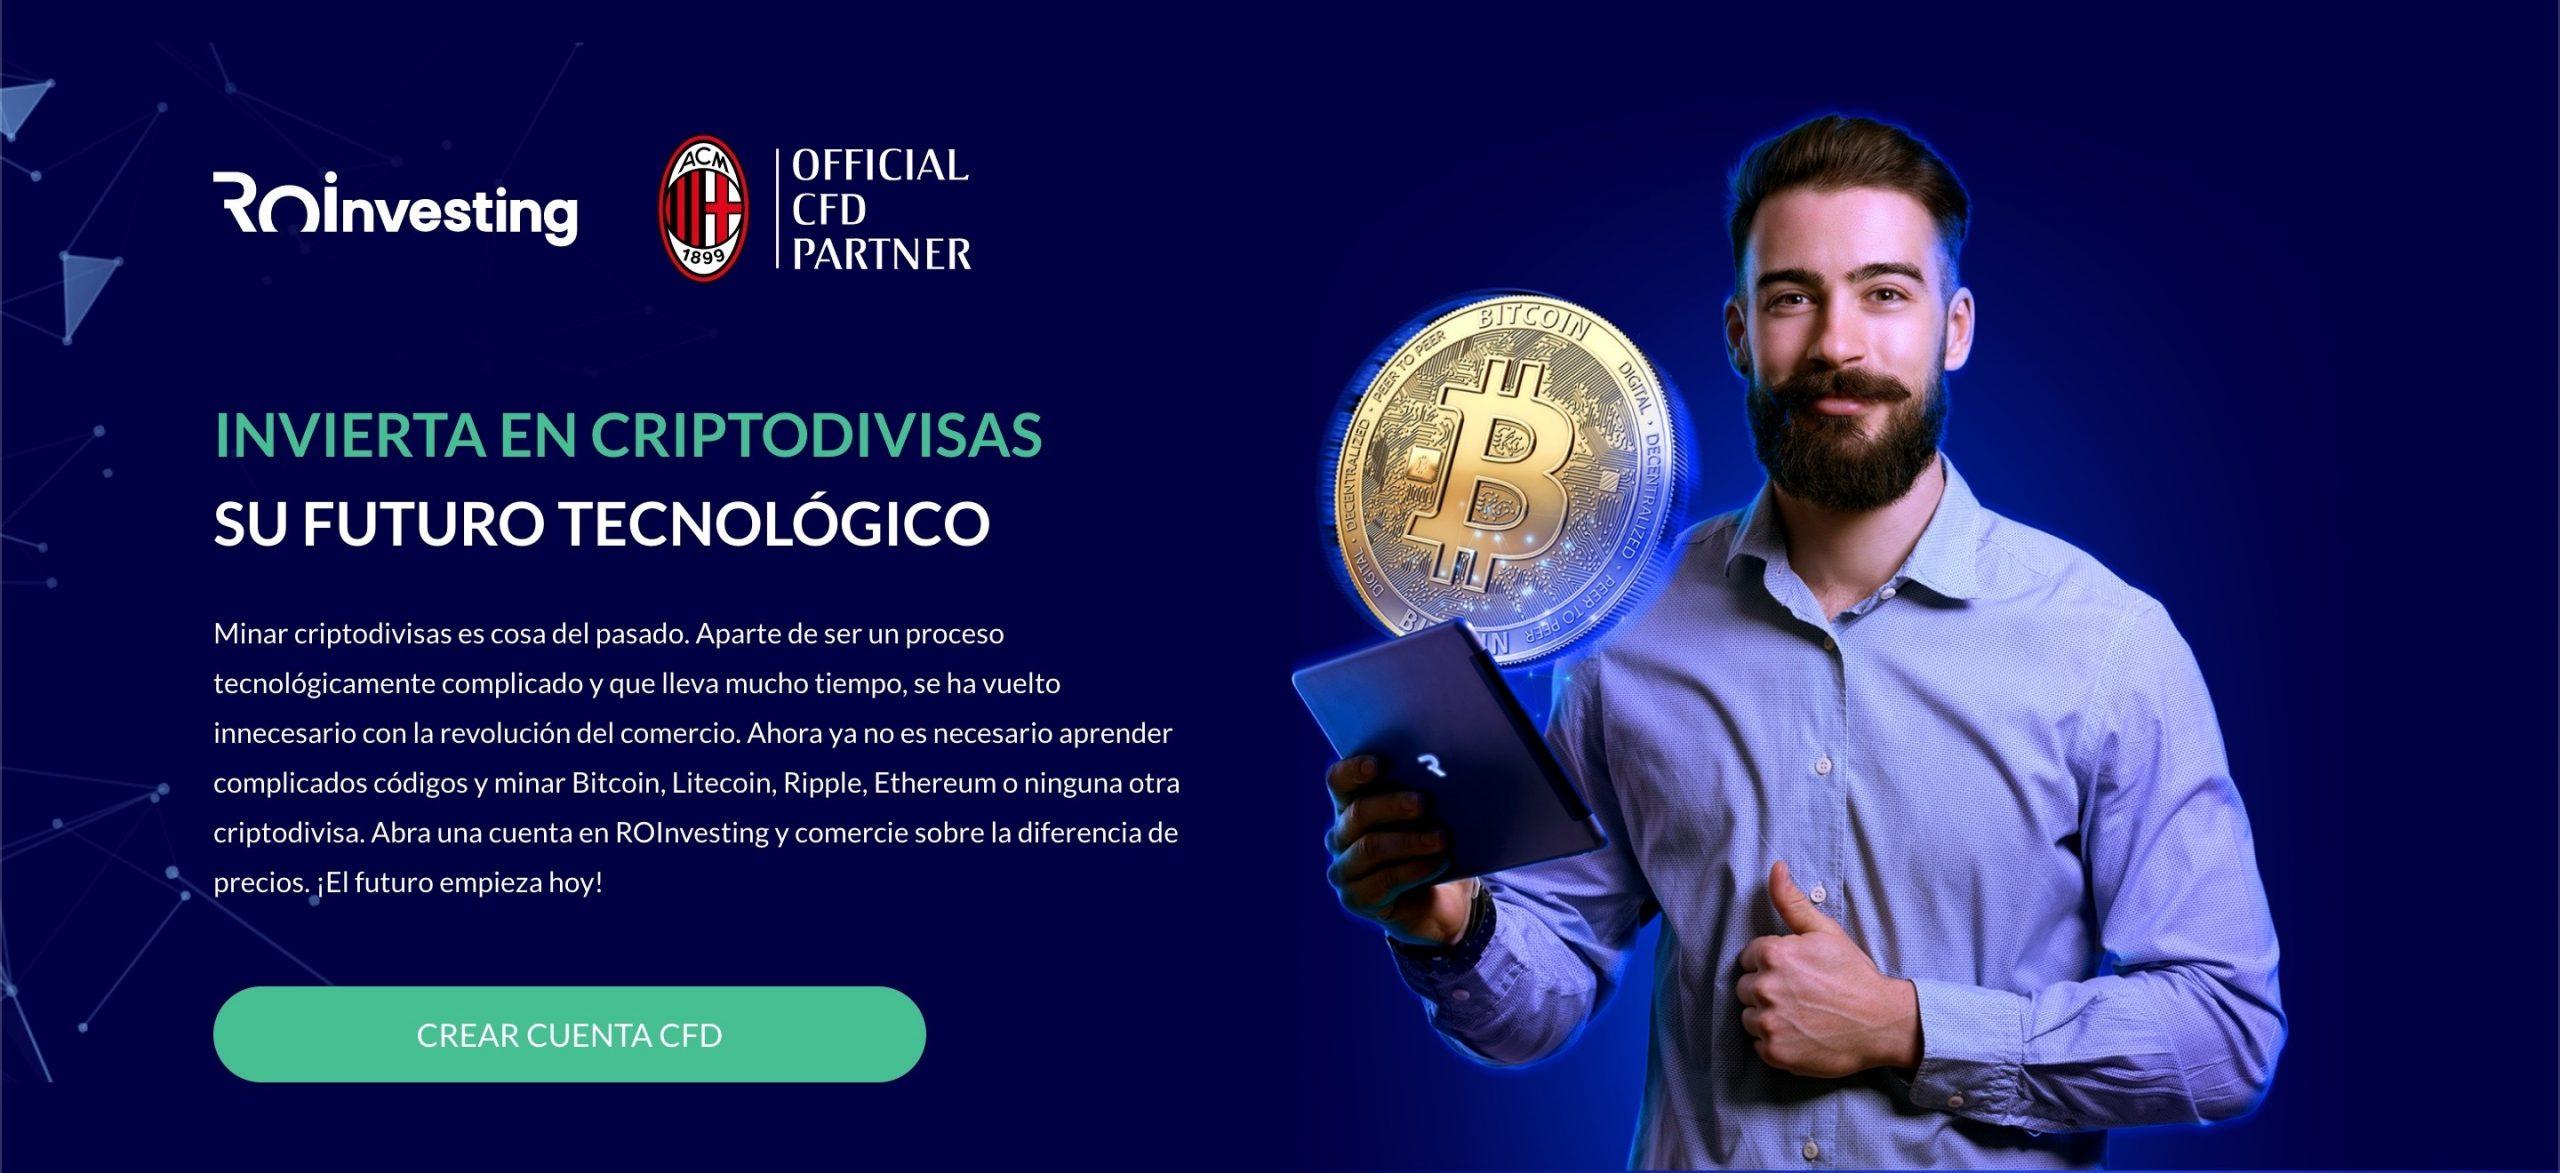 roinvesting broker regulados